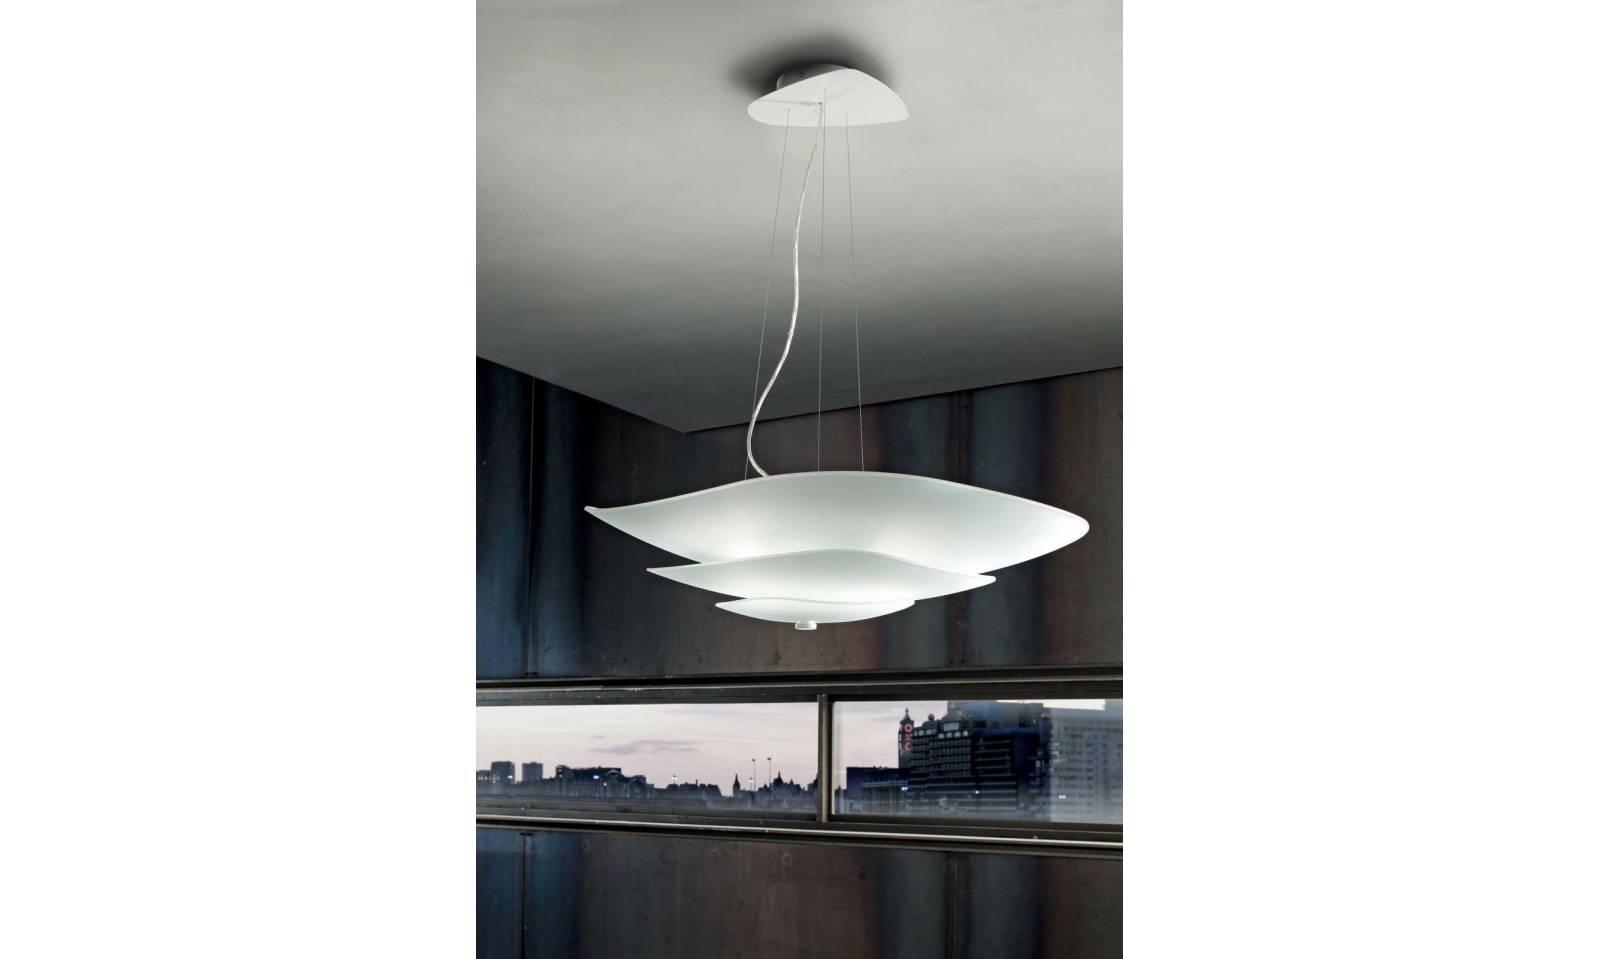 Lampada a sospensione linea light moderna in vetro serie moledro